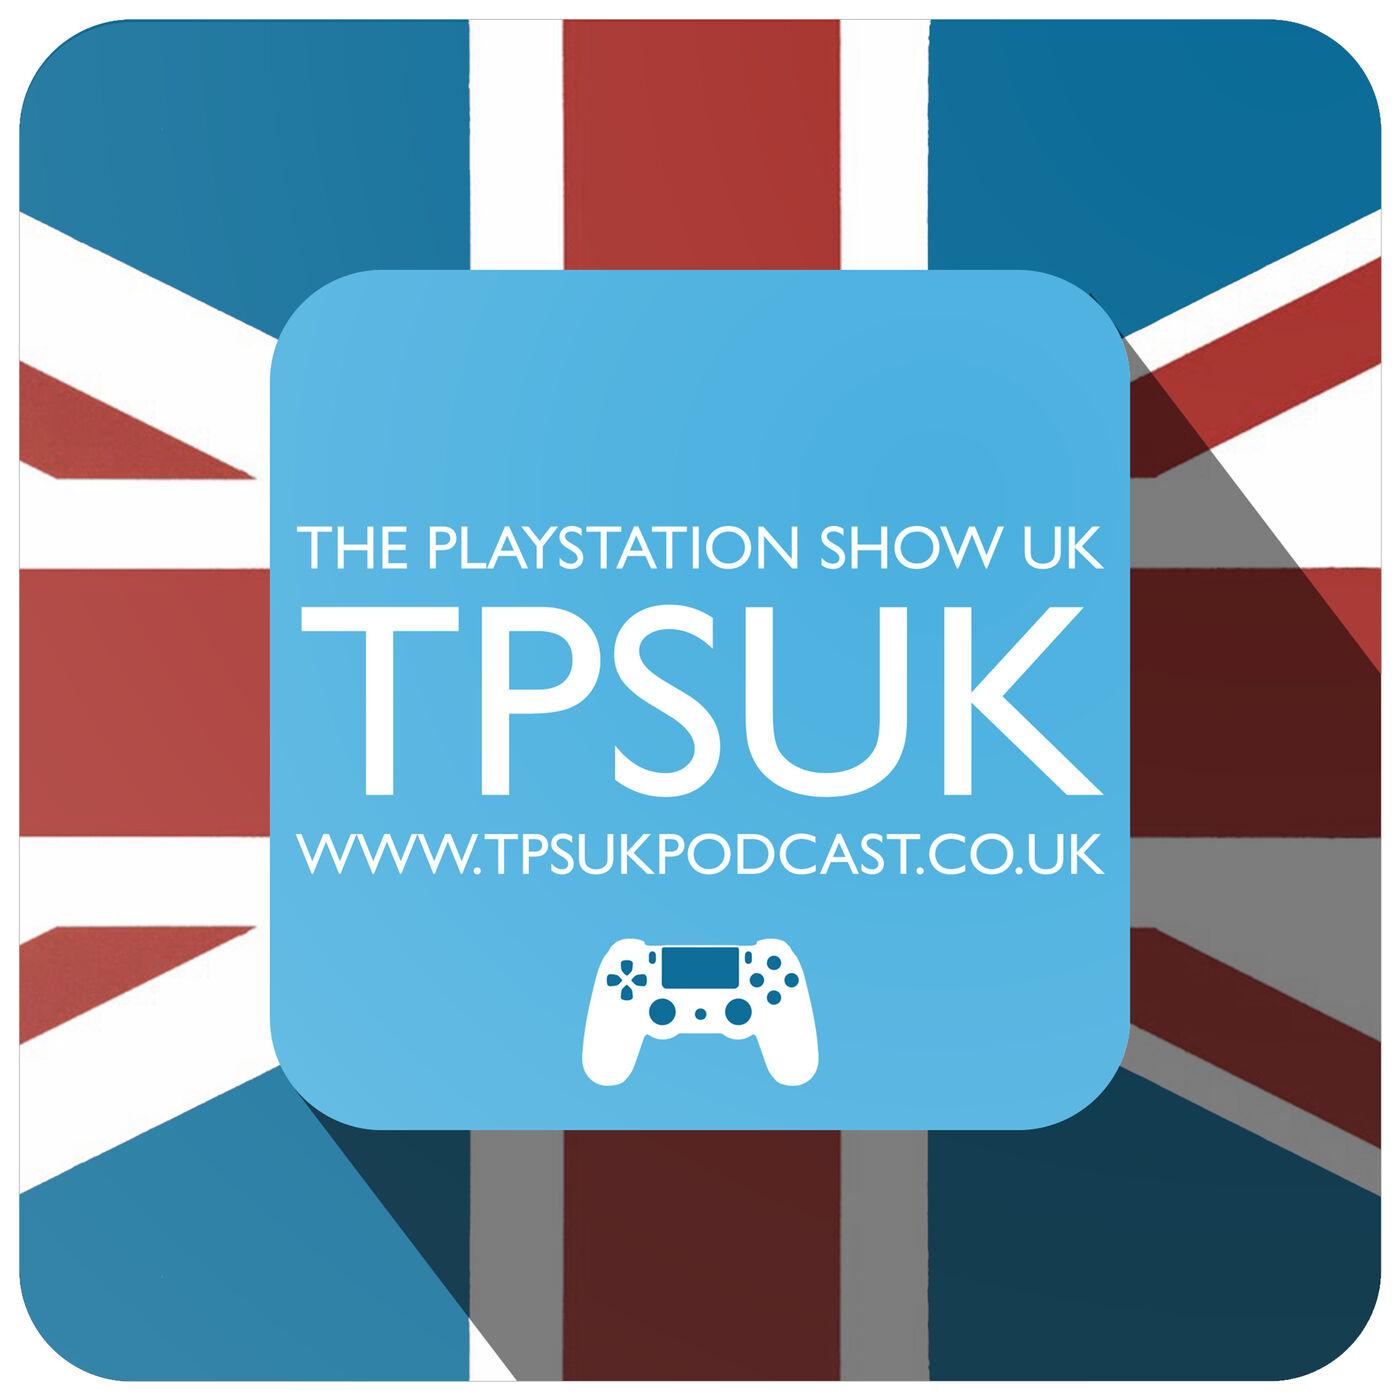 Artwork for podcast The Playstation Show UK (TpSUK)